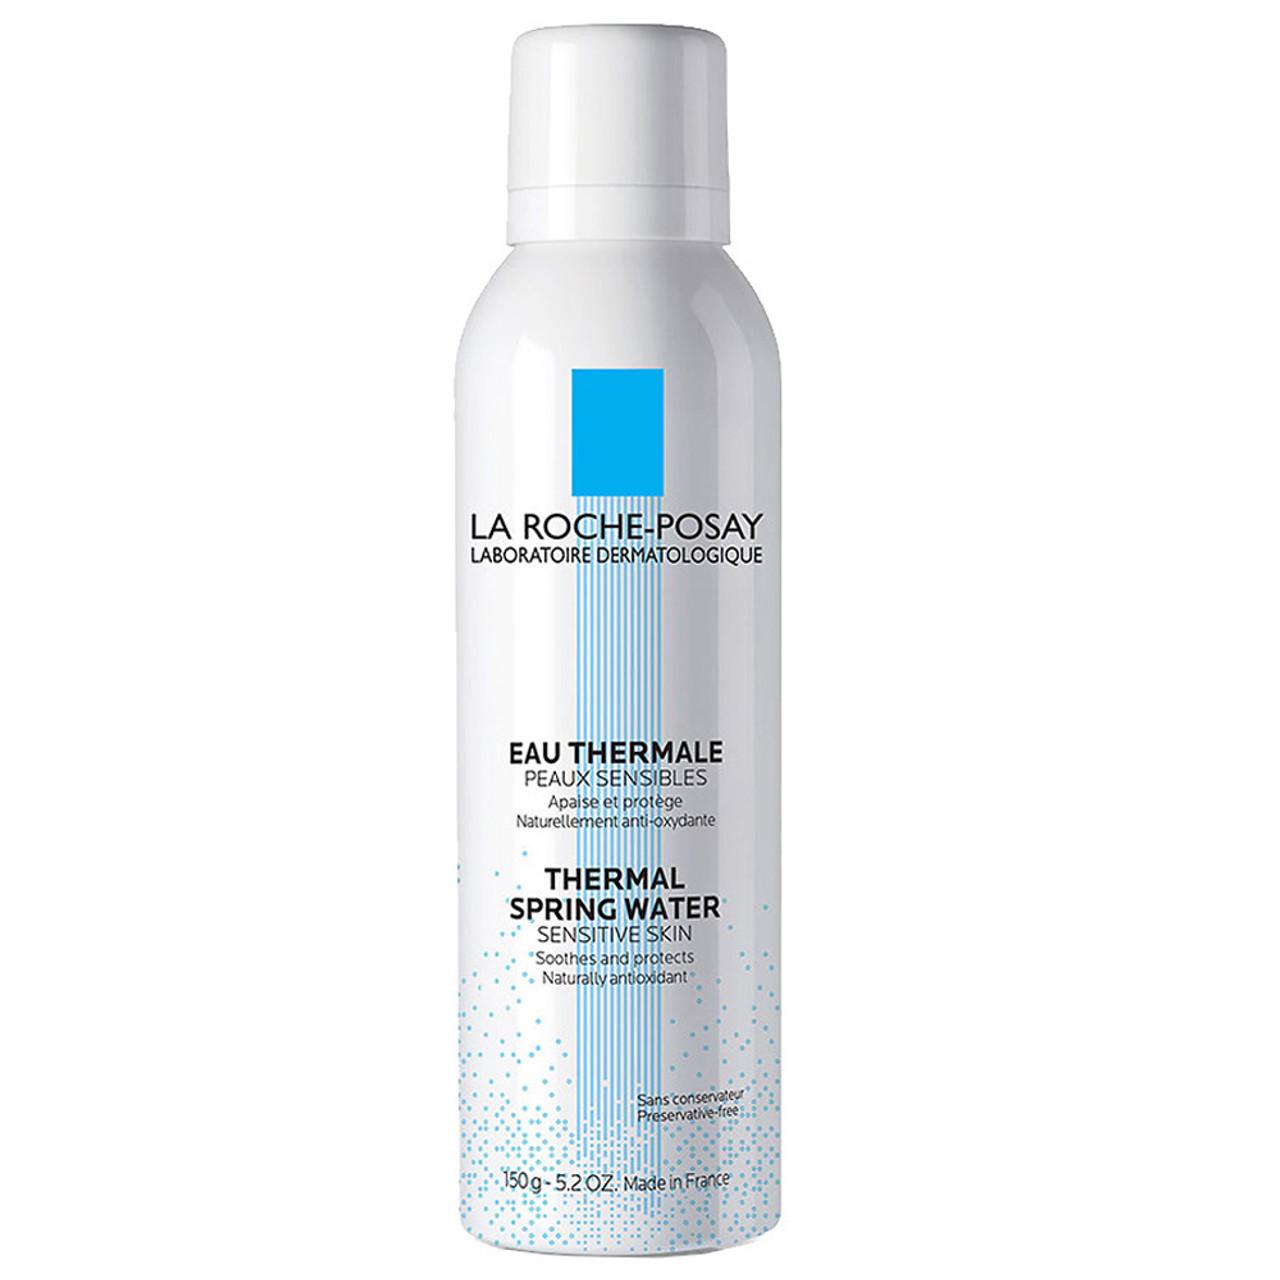 La Roche Posay Thermal Spring Water - 300 g / 10.5 fl oz